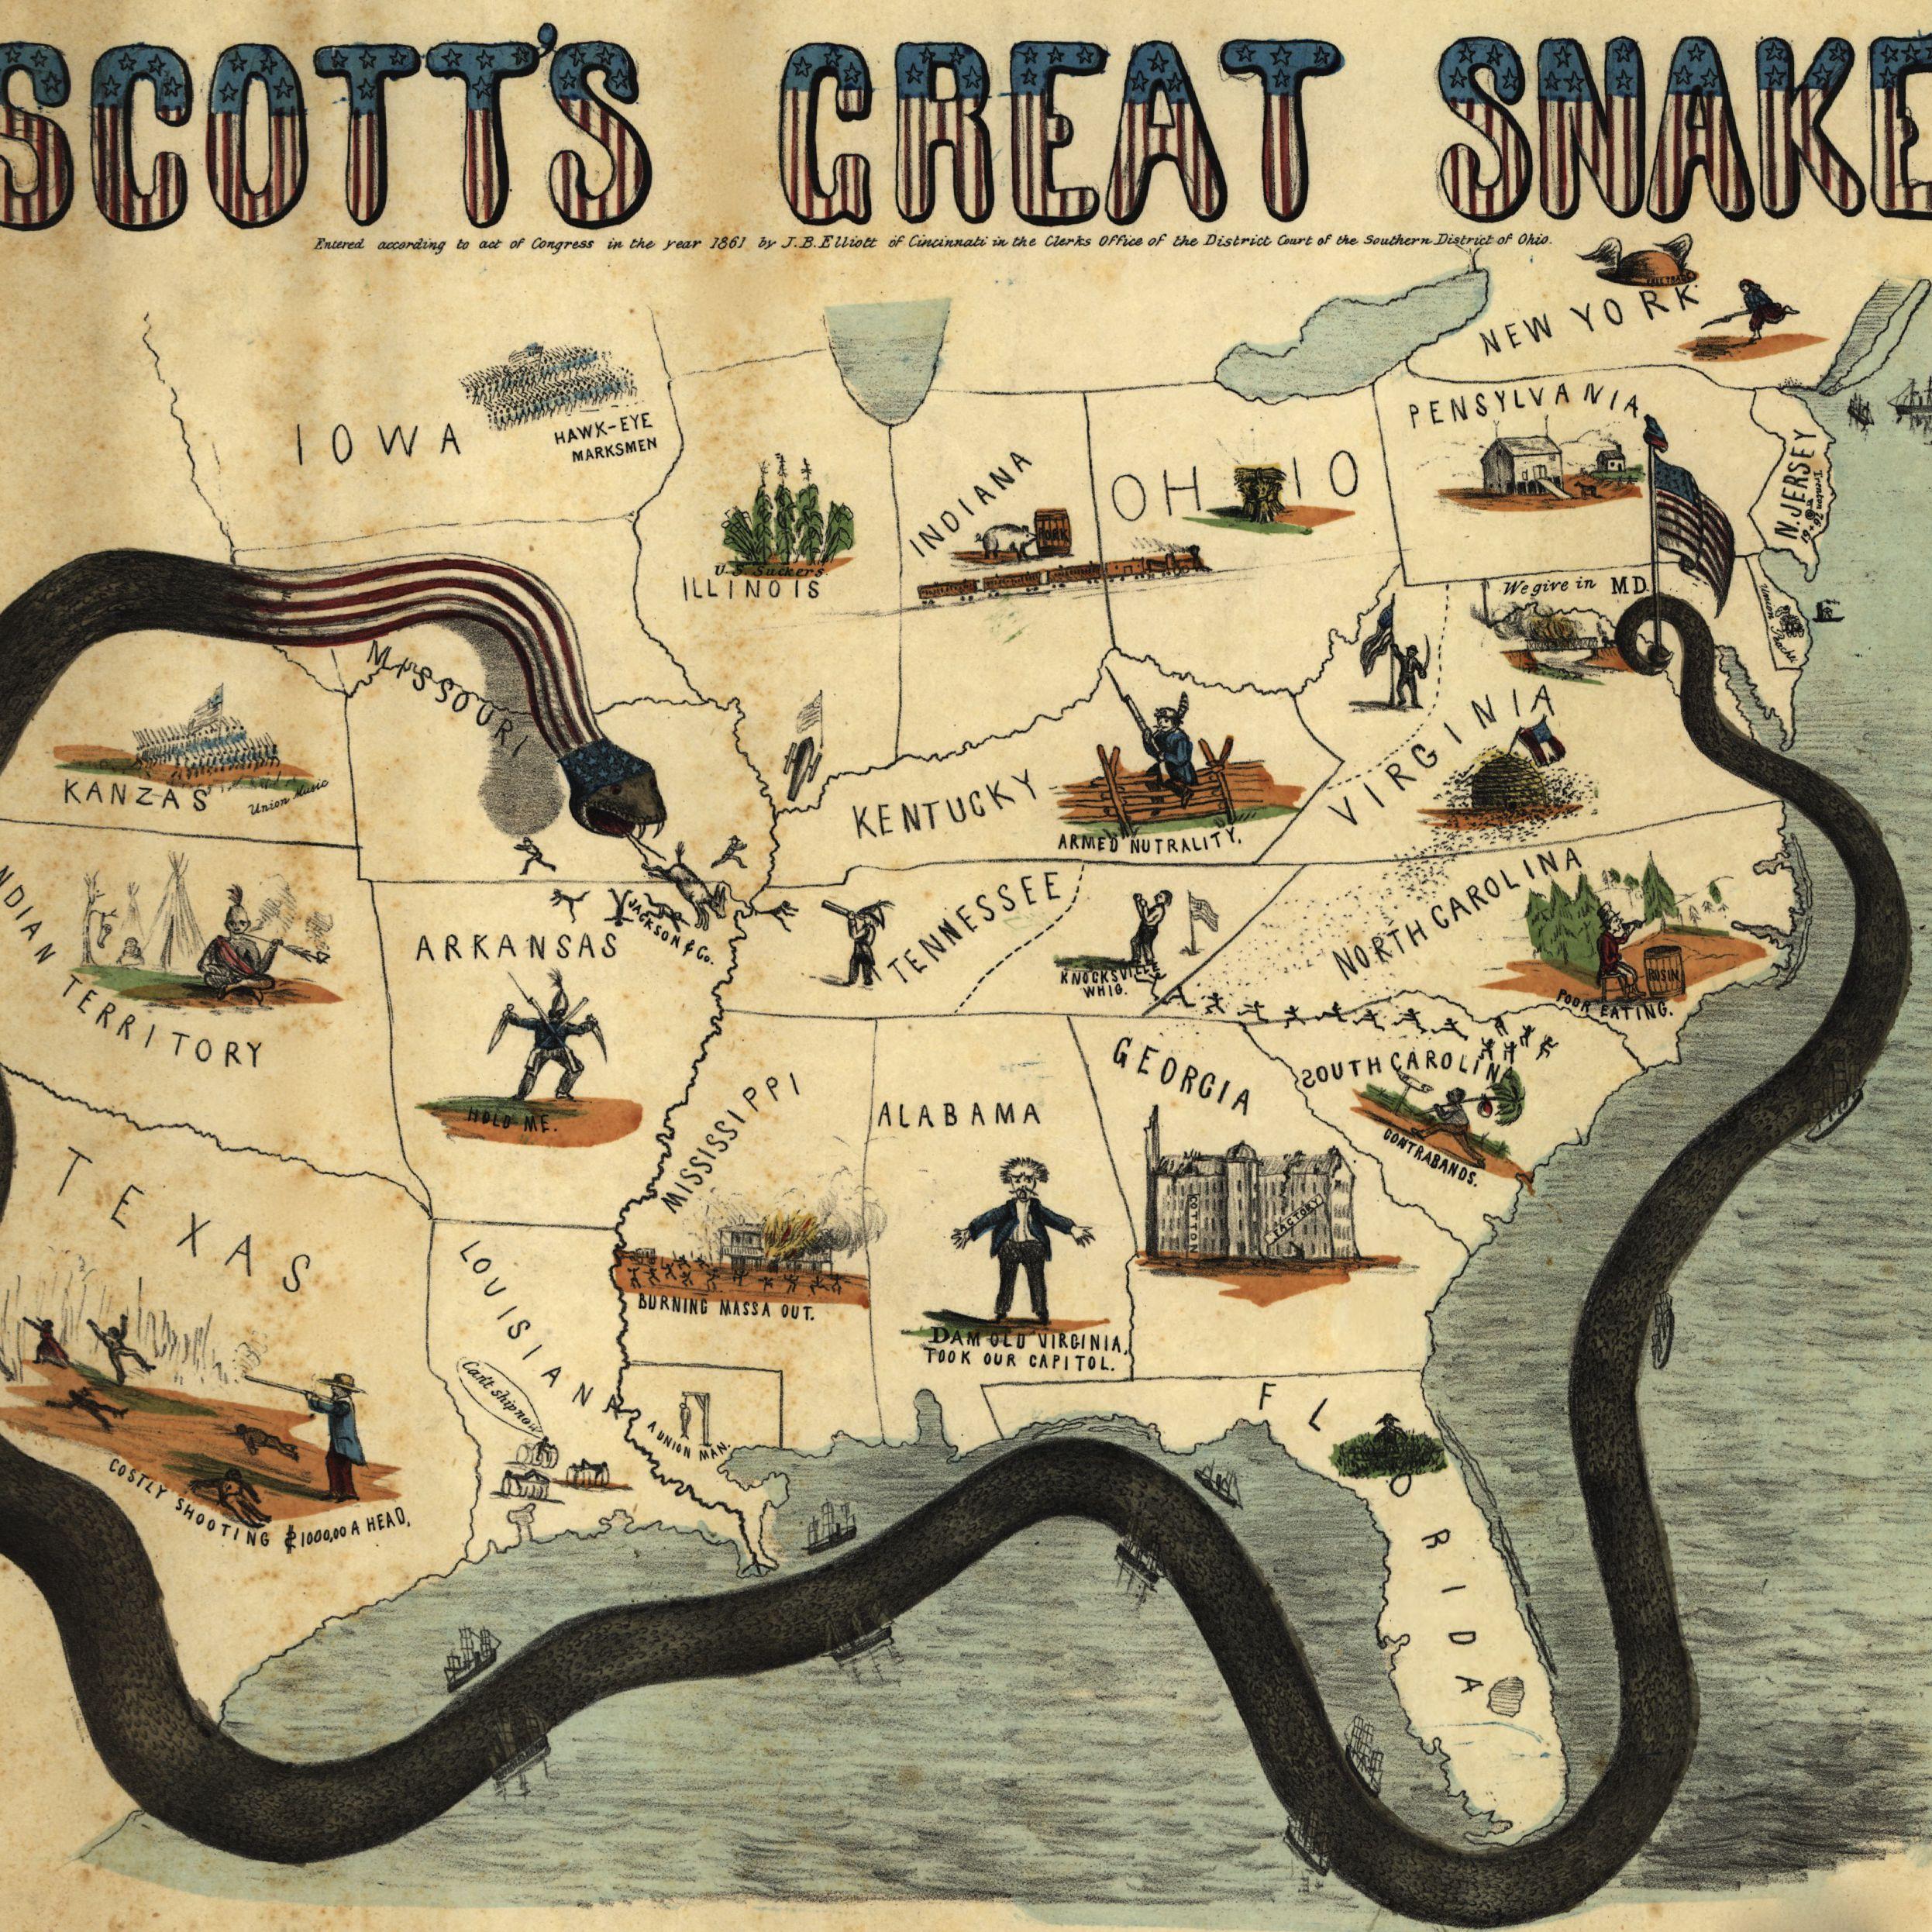 The Anaconda Plan of 1861: Early Civil War Strategy